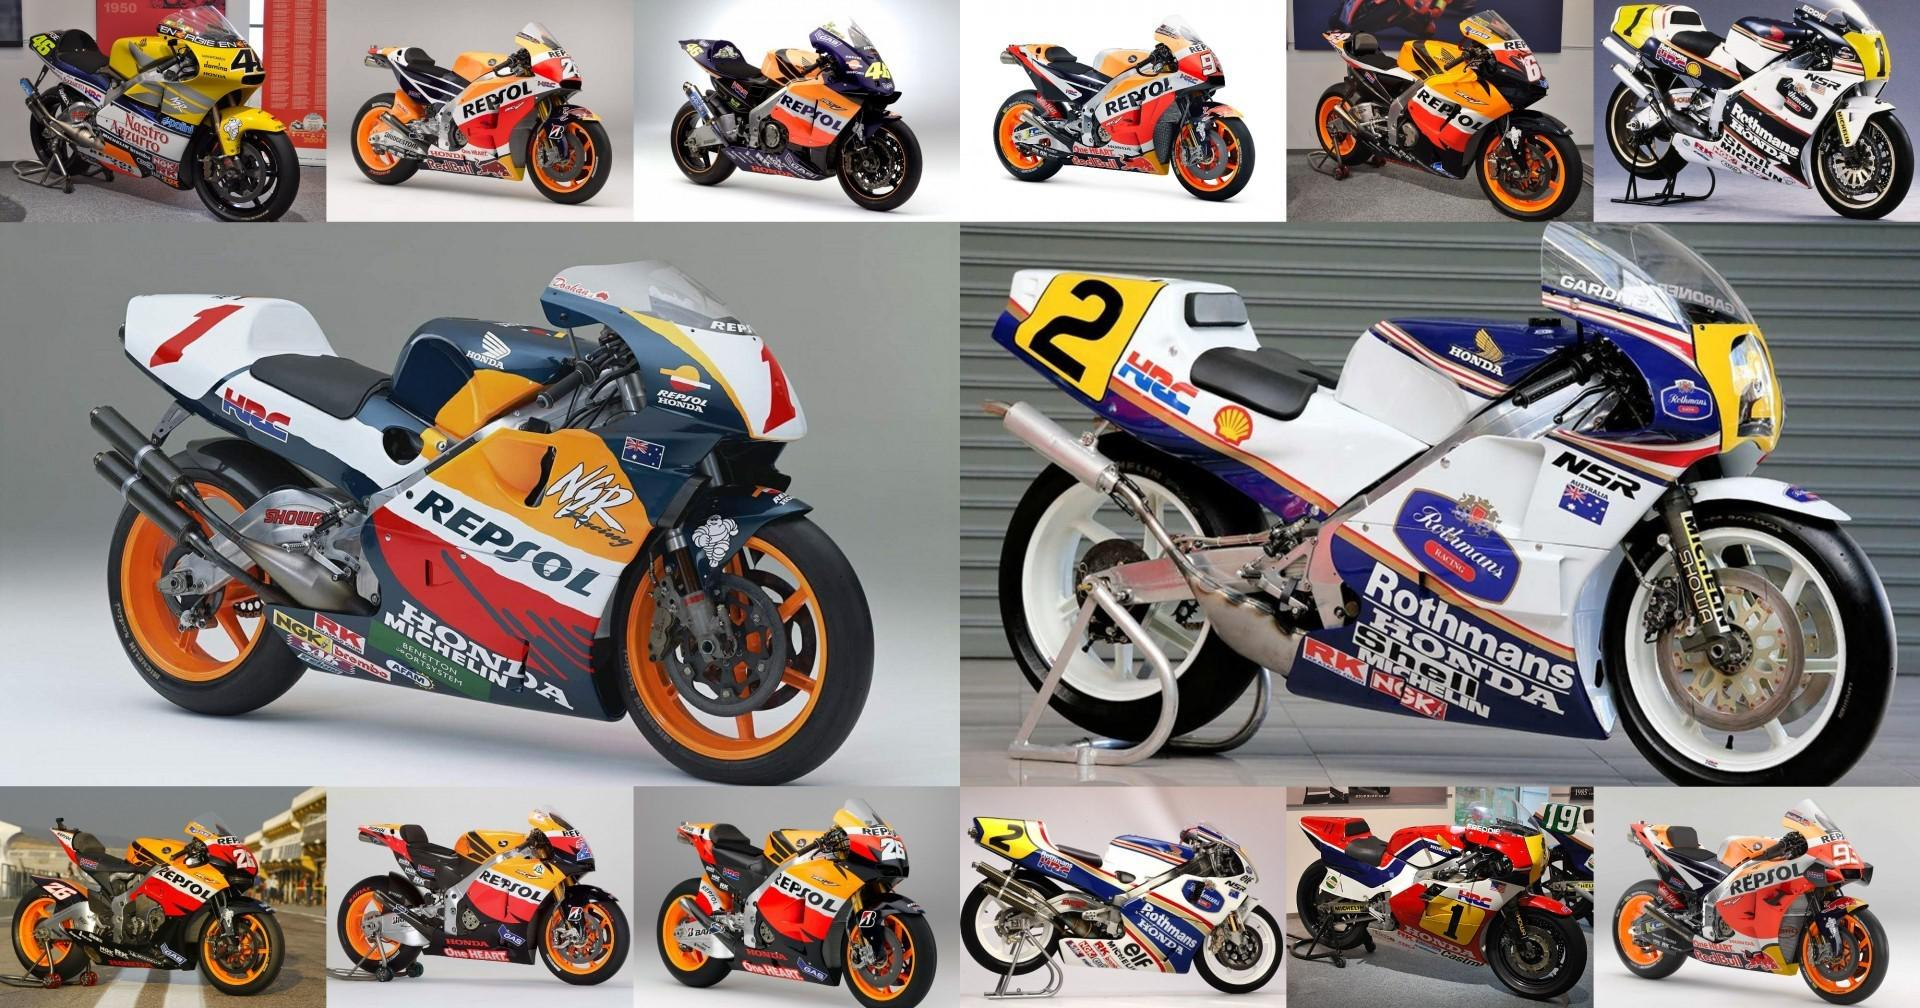 Moto GP Honda: Evolution de la puissance